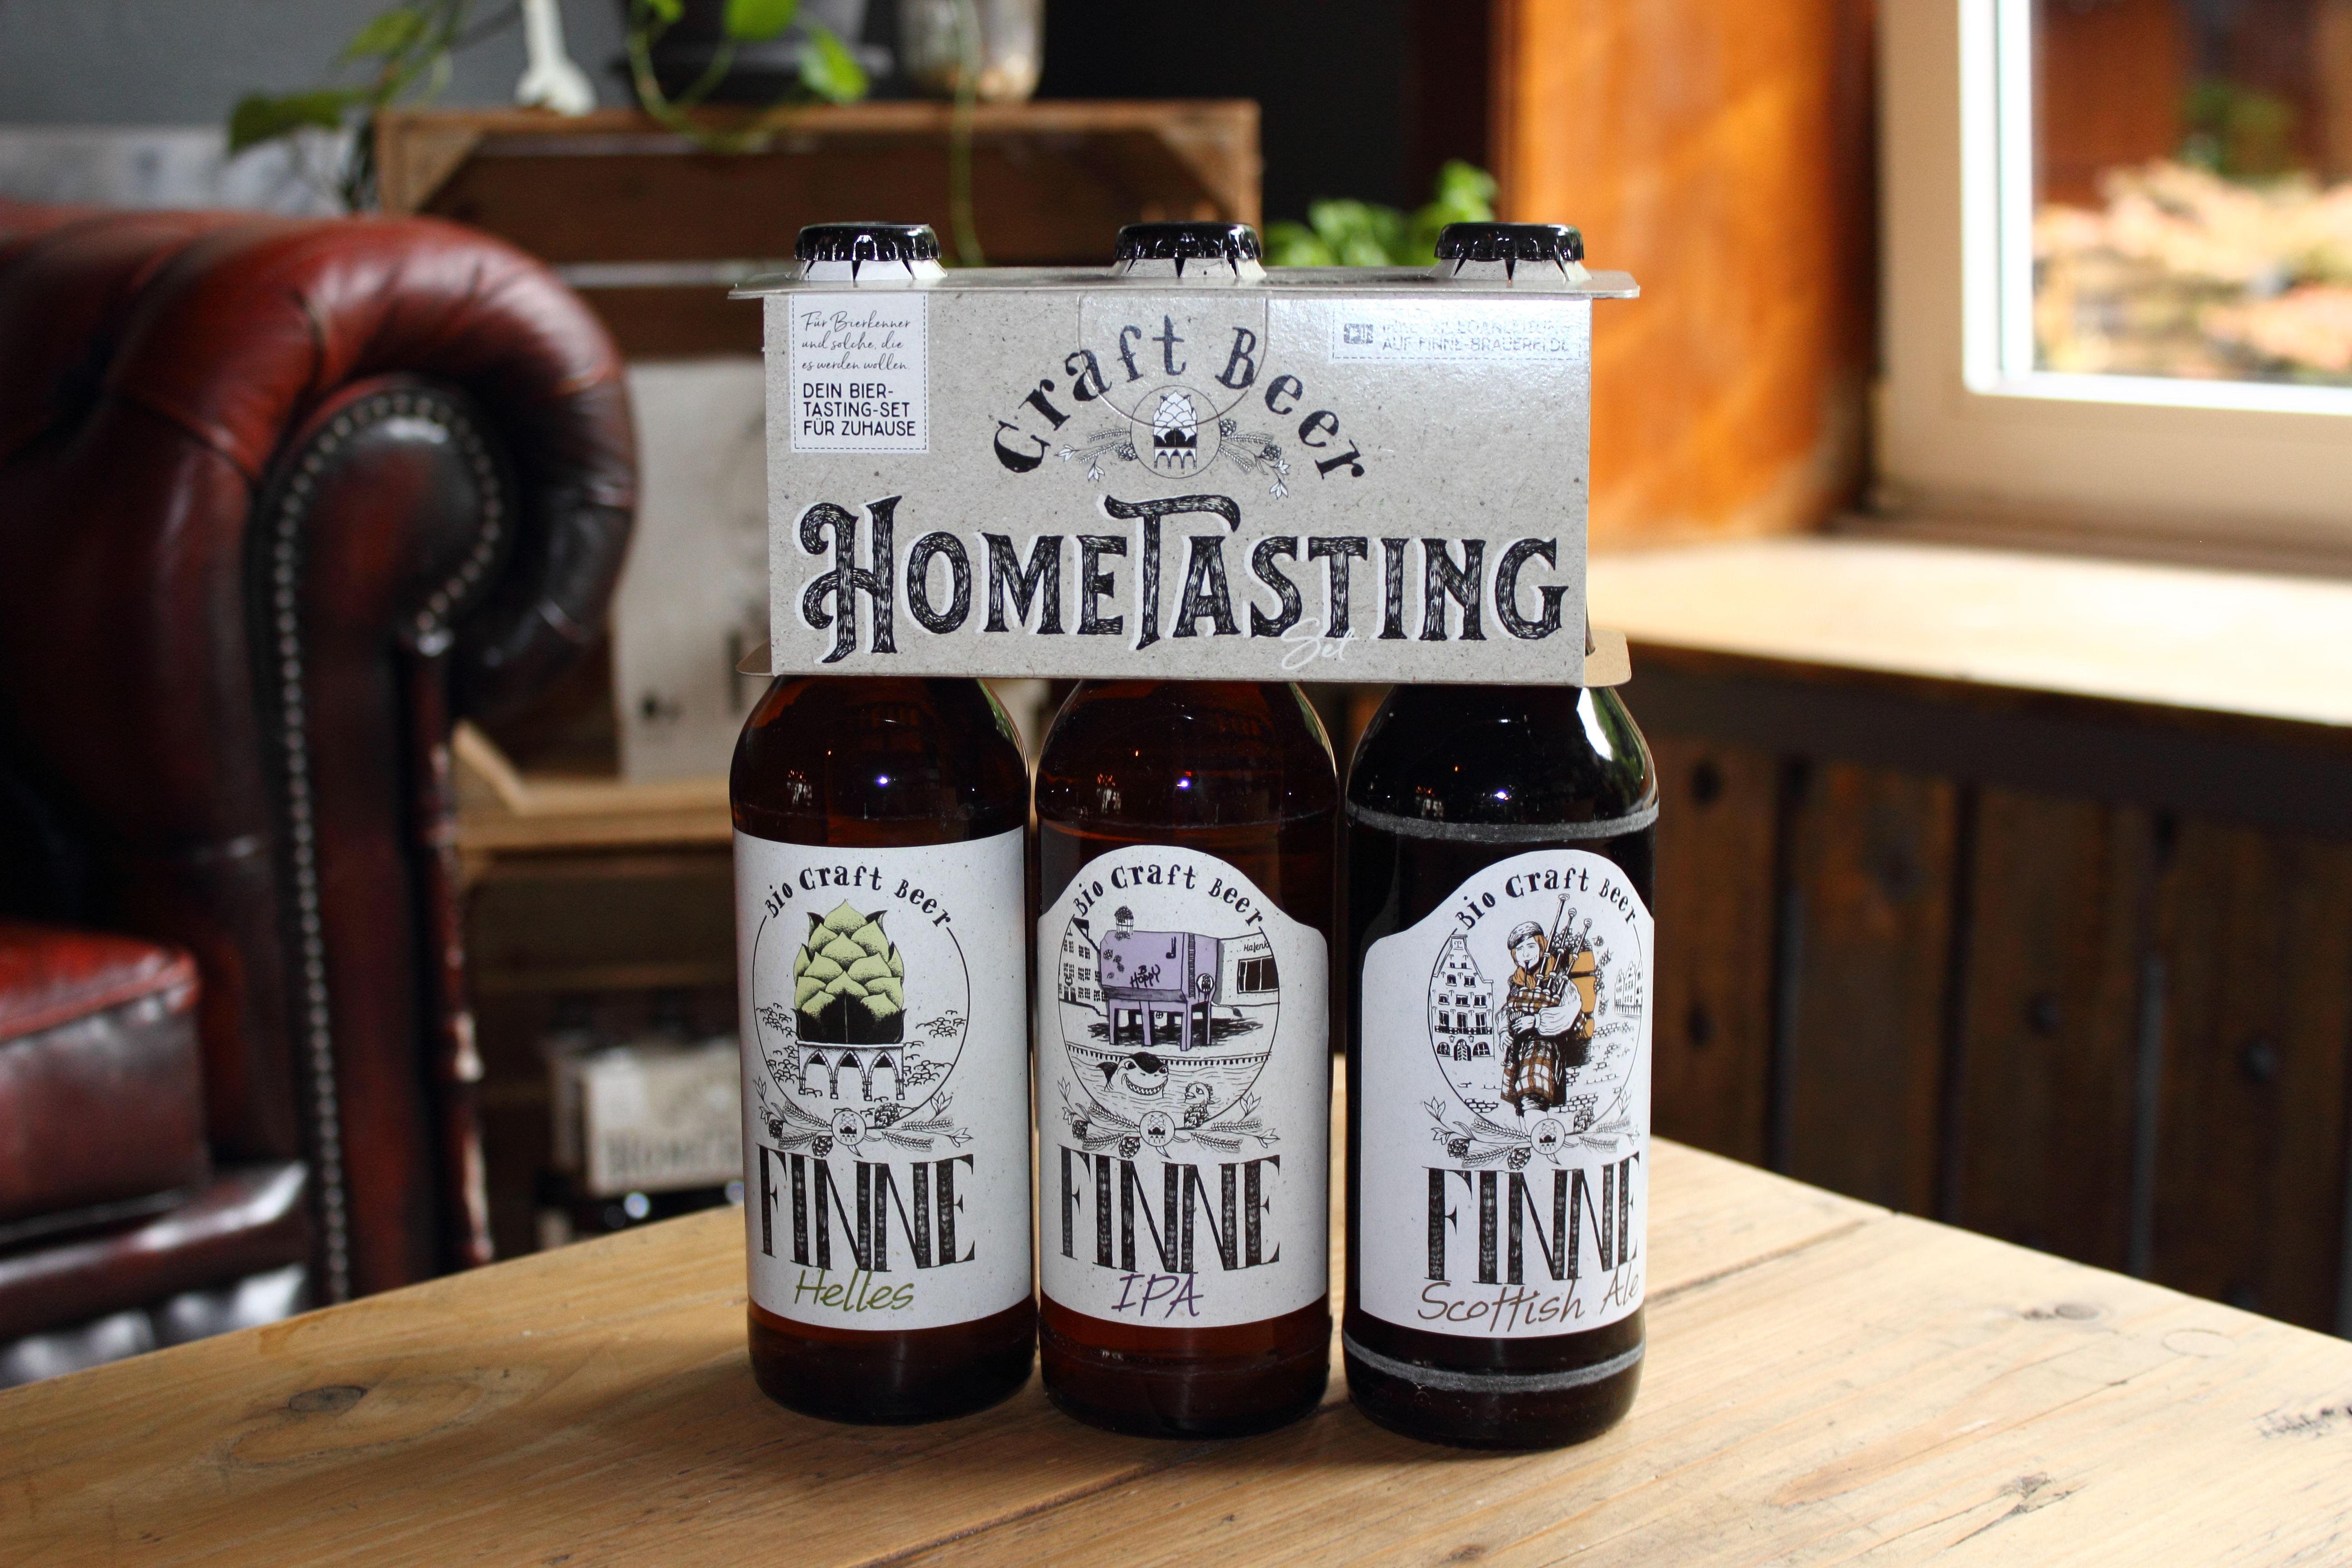 Finne Brauerei Hometasting